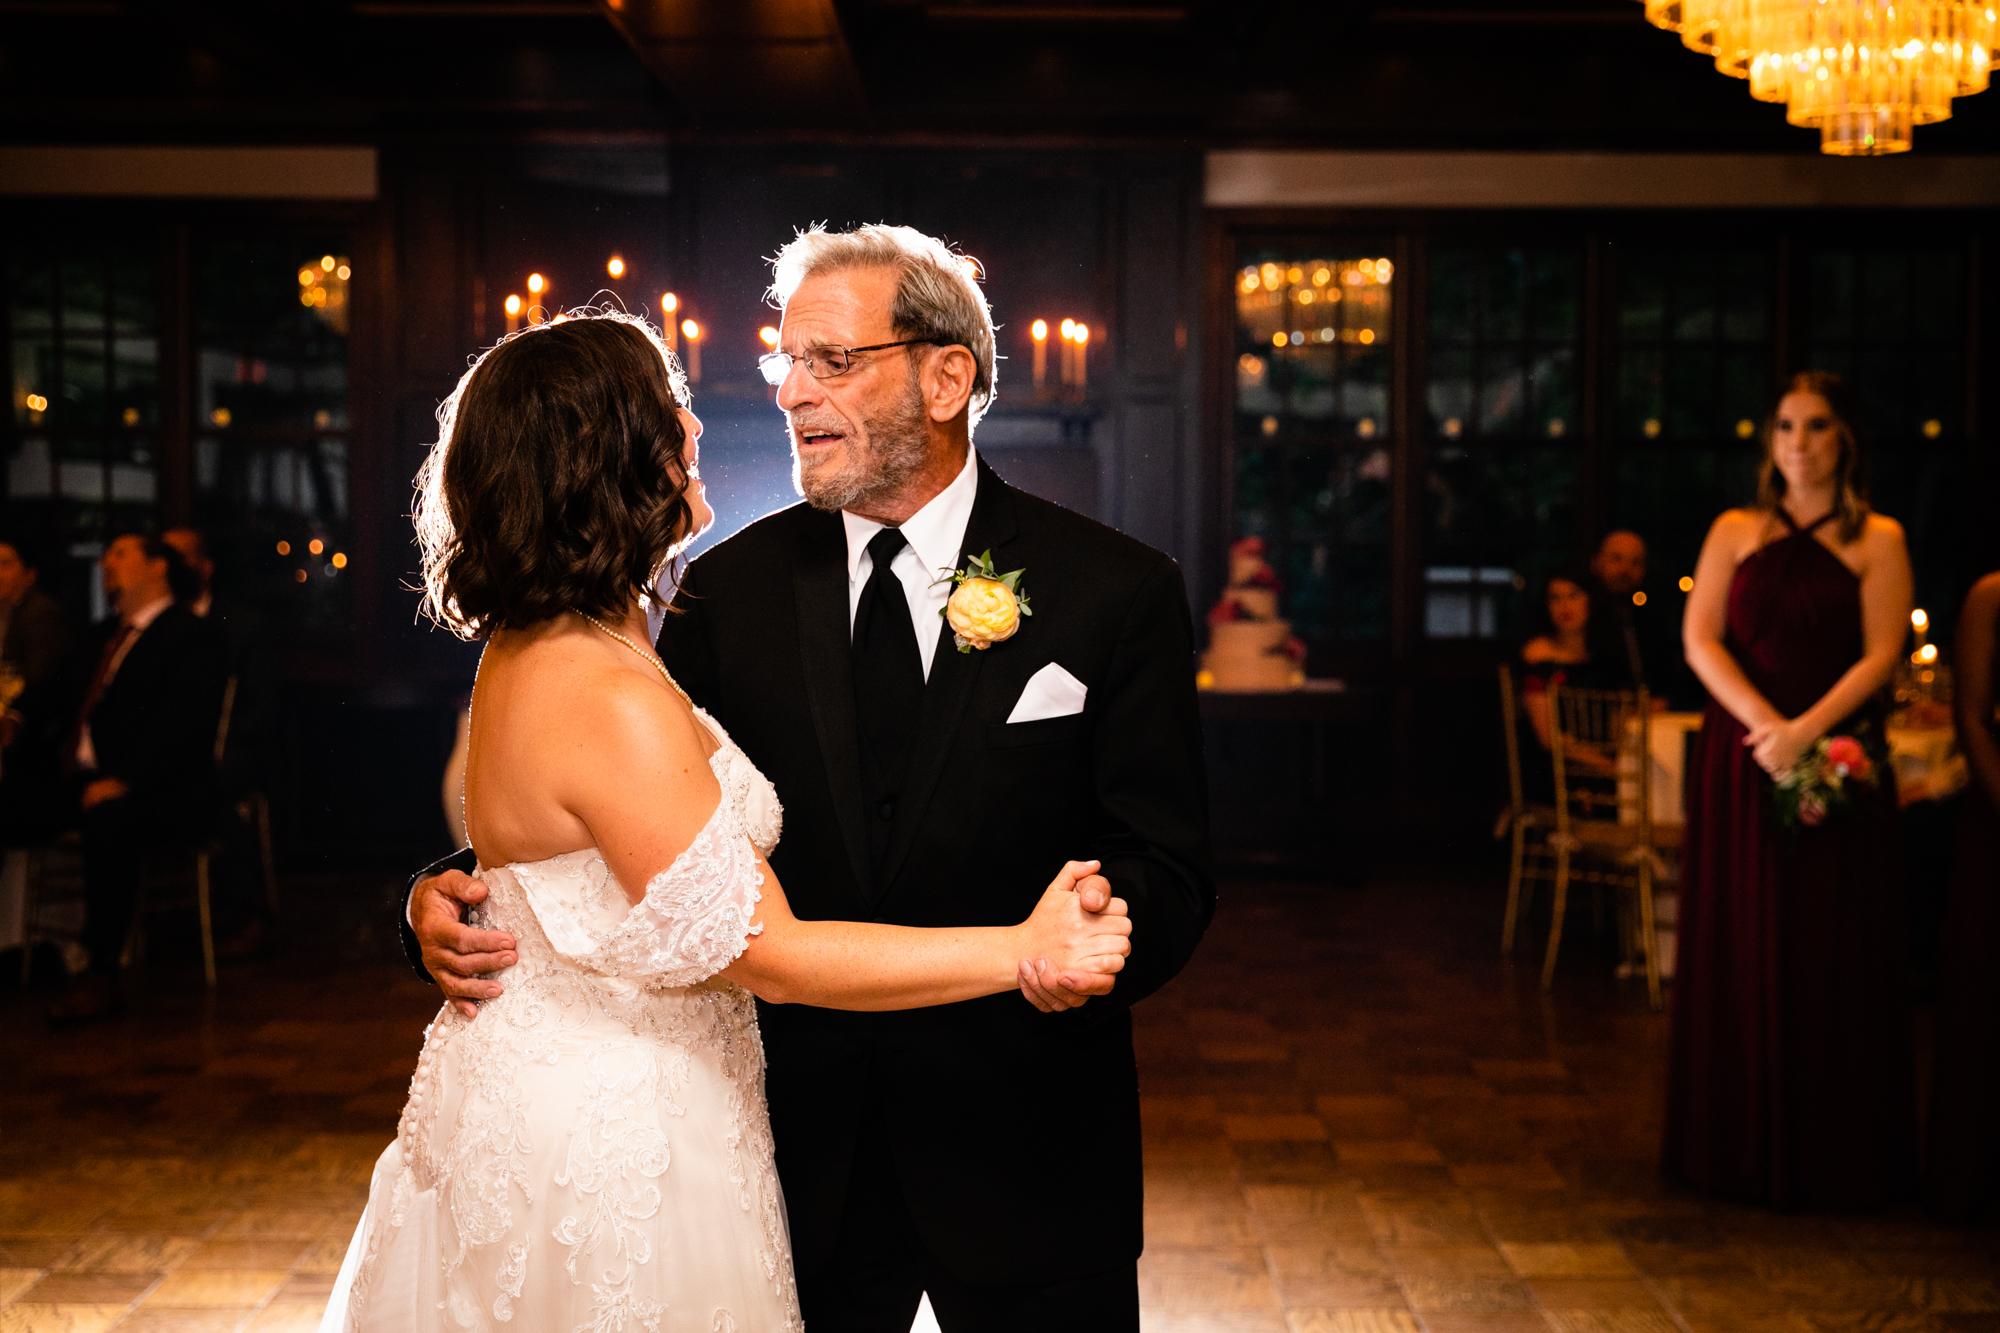 Hotel Du Village - LoveStruck Pictures - Wedding Photography-087.jpg